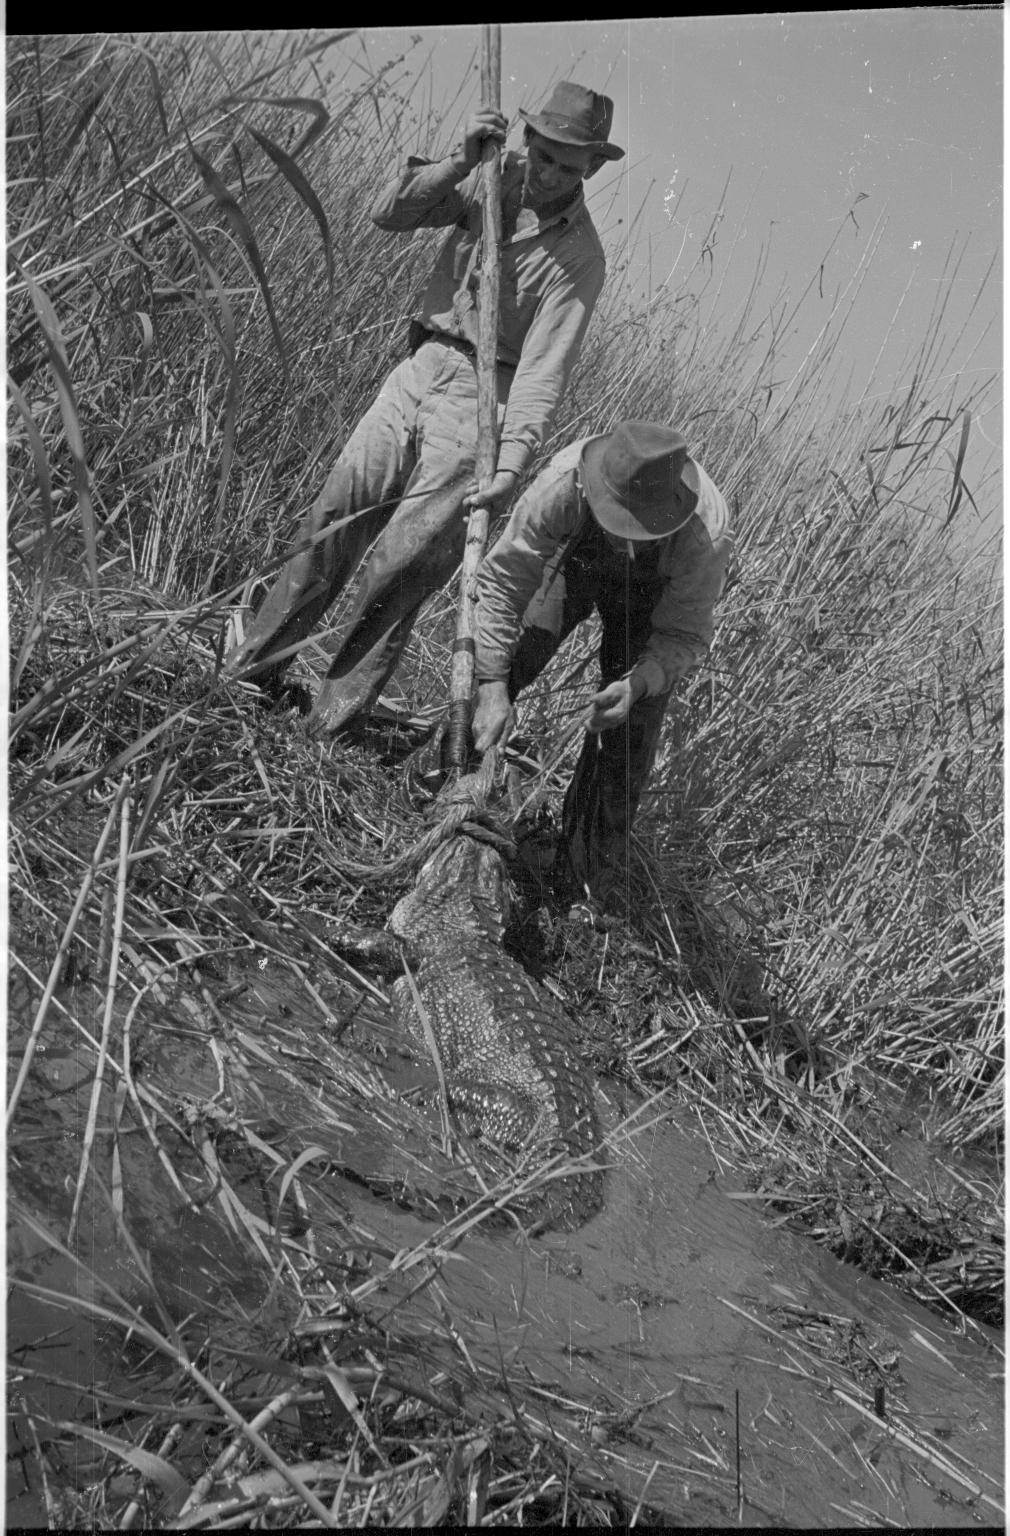 Alligator hunting in Louisiana